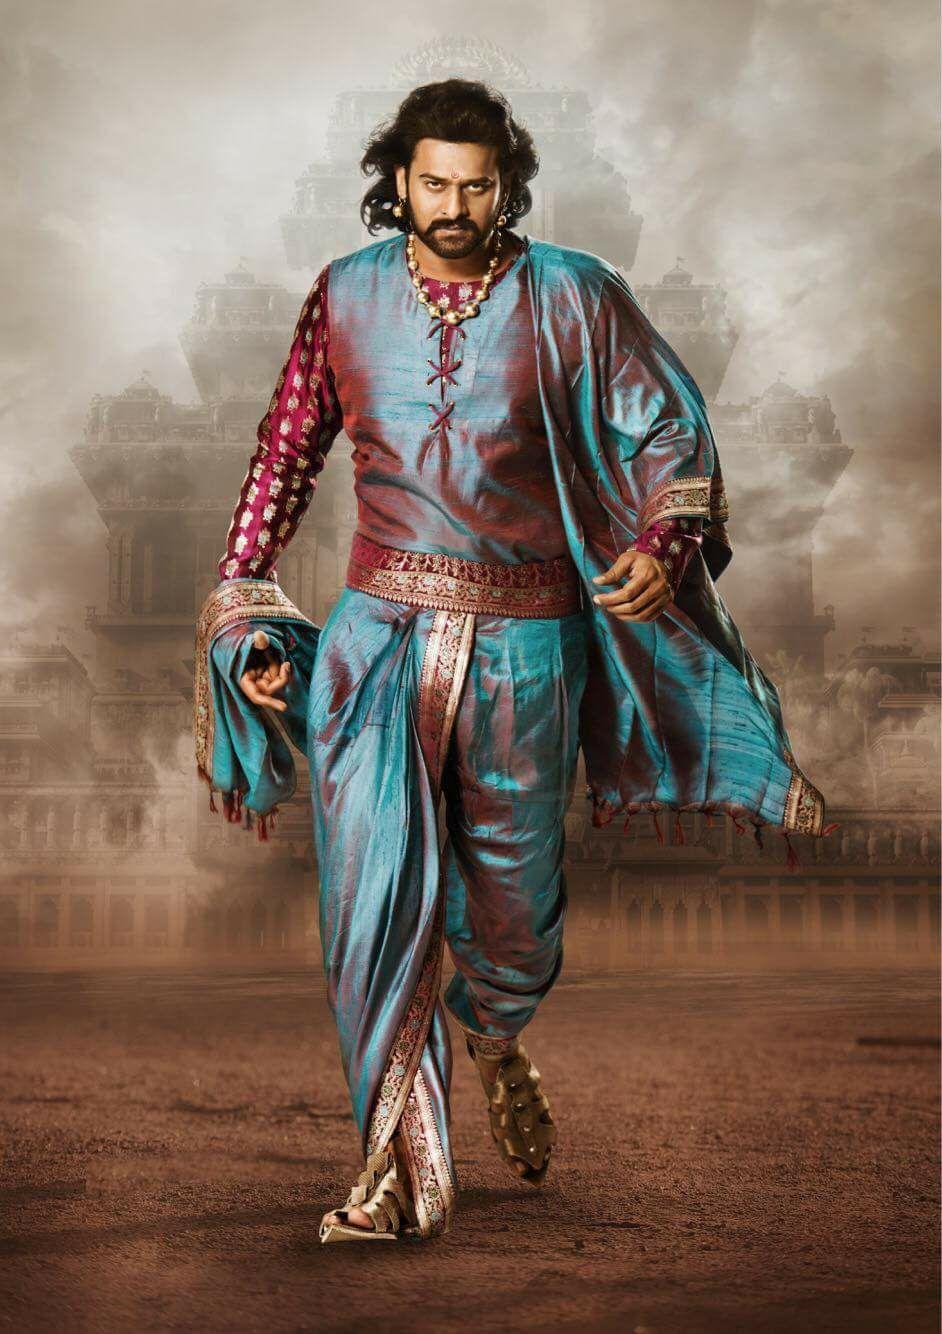 Pin By Mayursdesignetrunk On Bahubali Actors Prabhas Pics